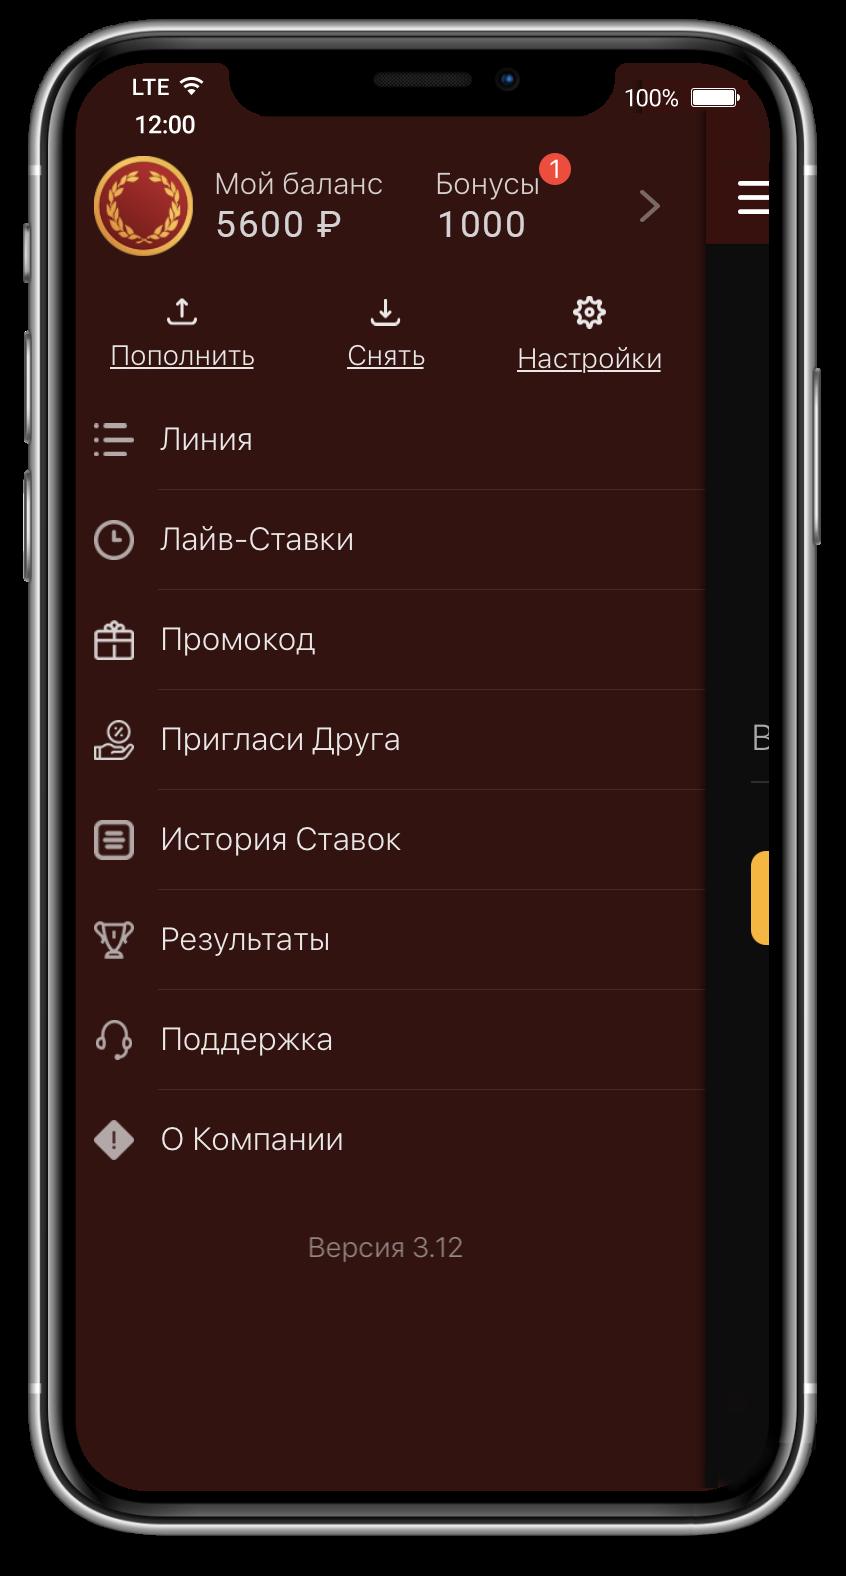 айфон меню олимпбет